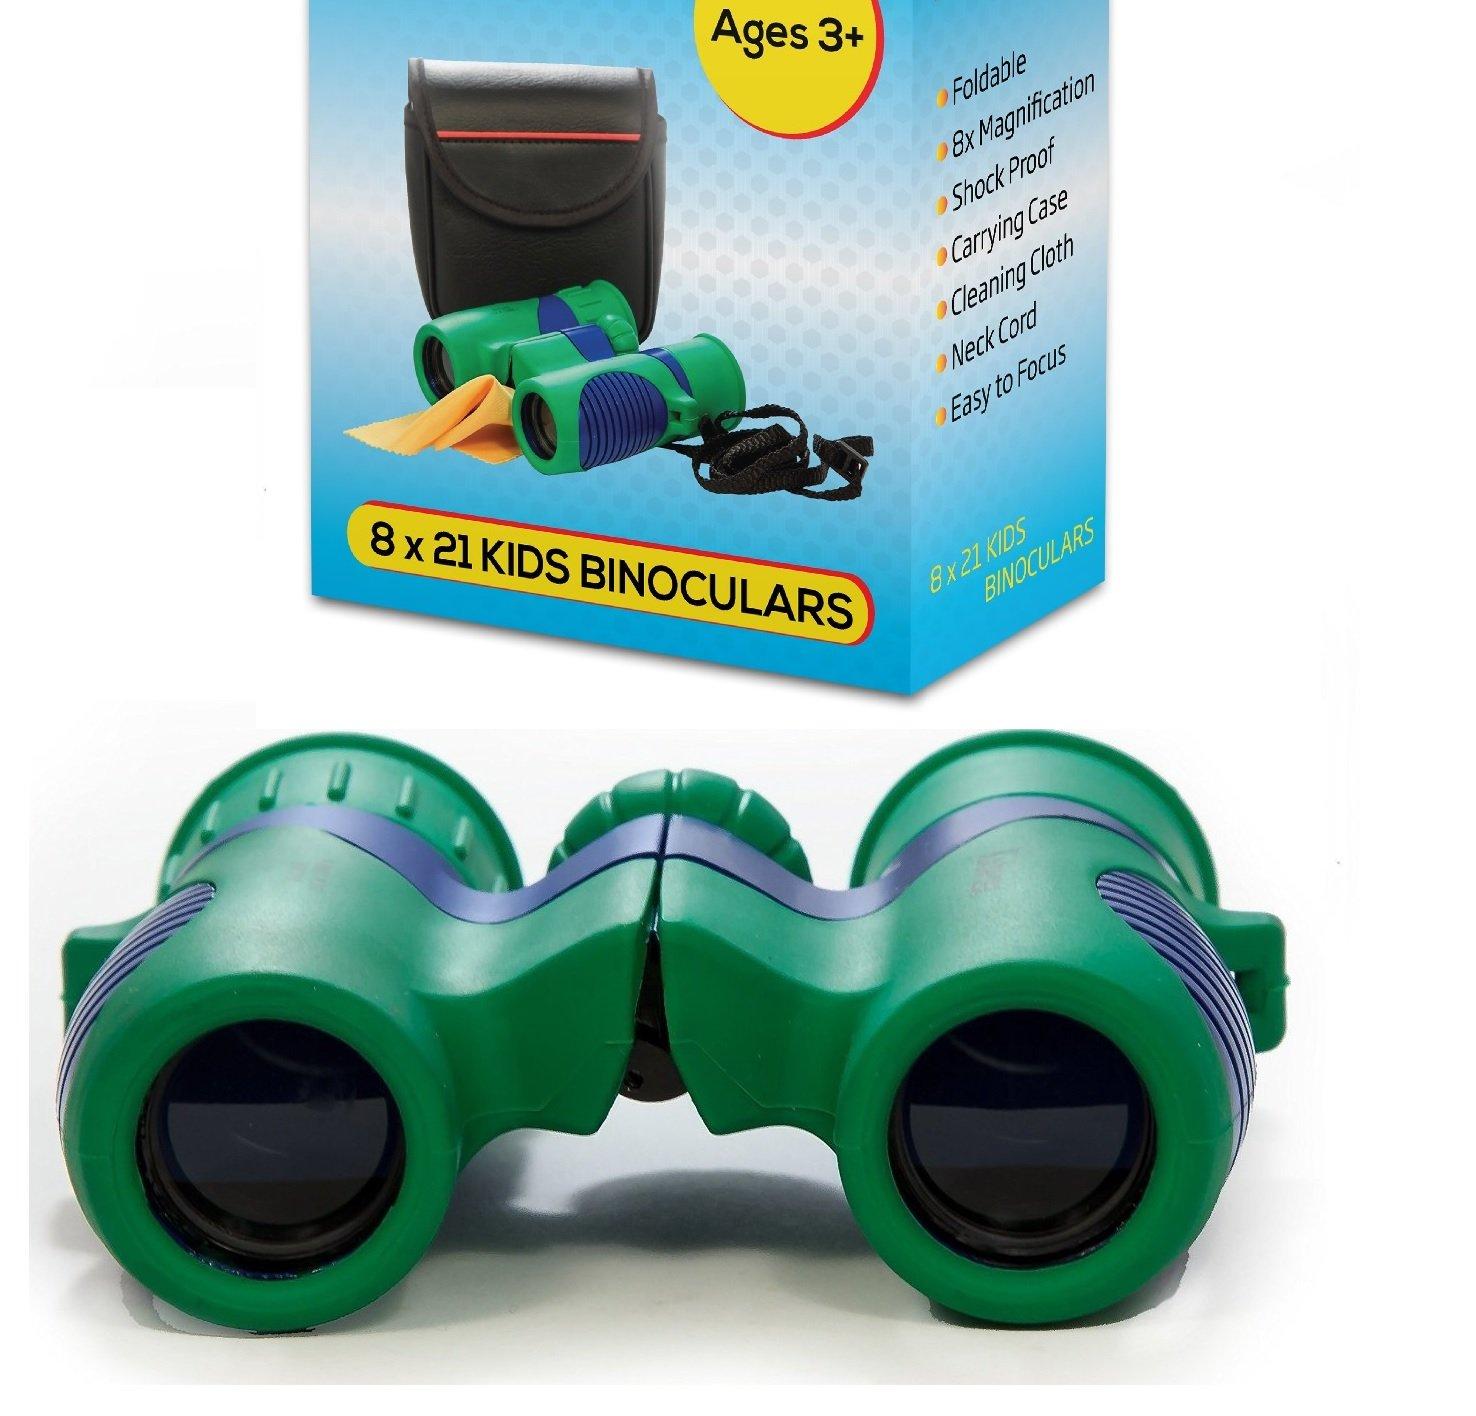 Kidwinz Shock Proof 8x21 Kids Binoculars Set High Resolution Real Optics